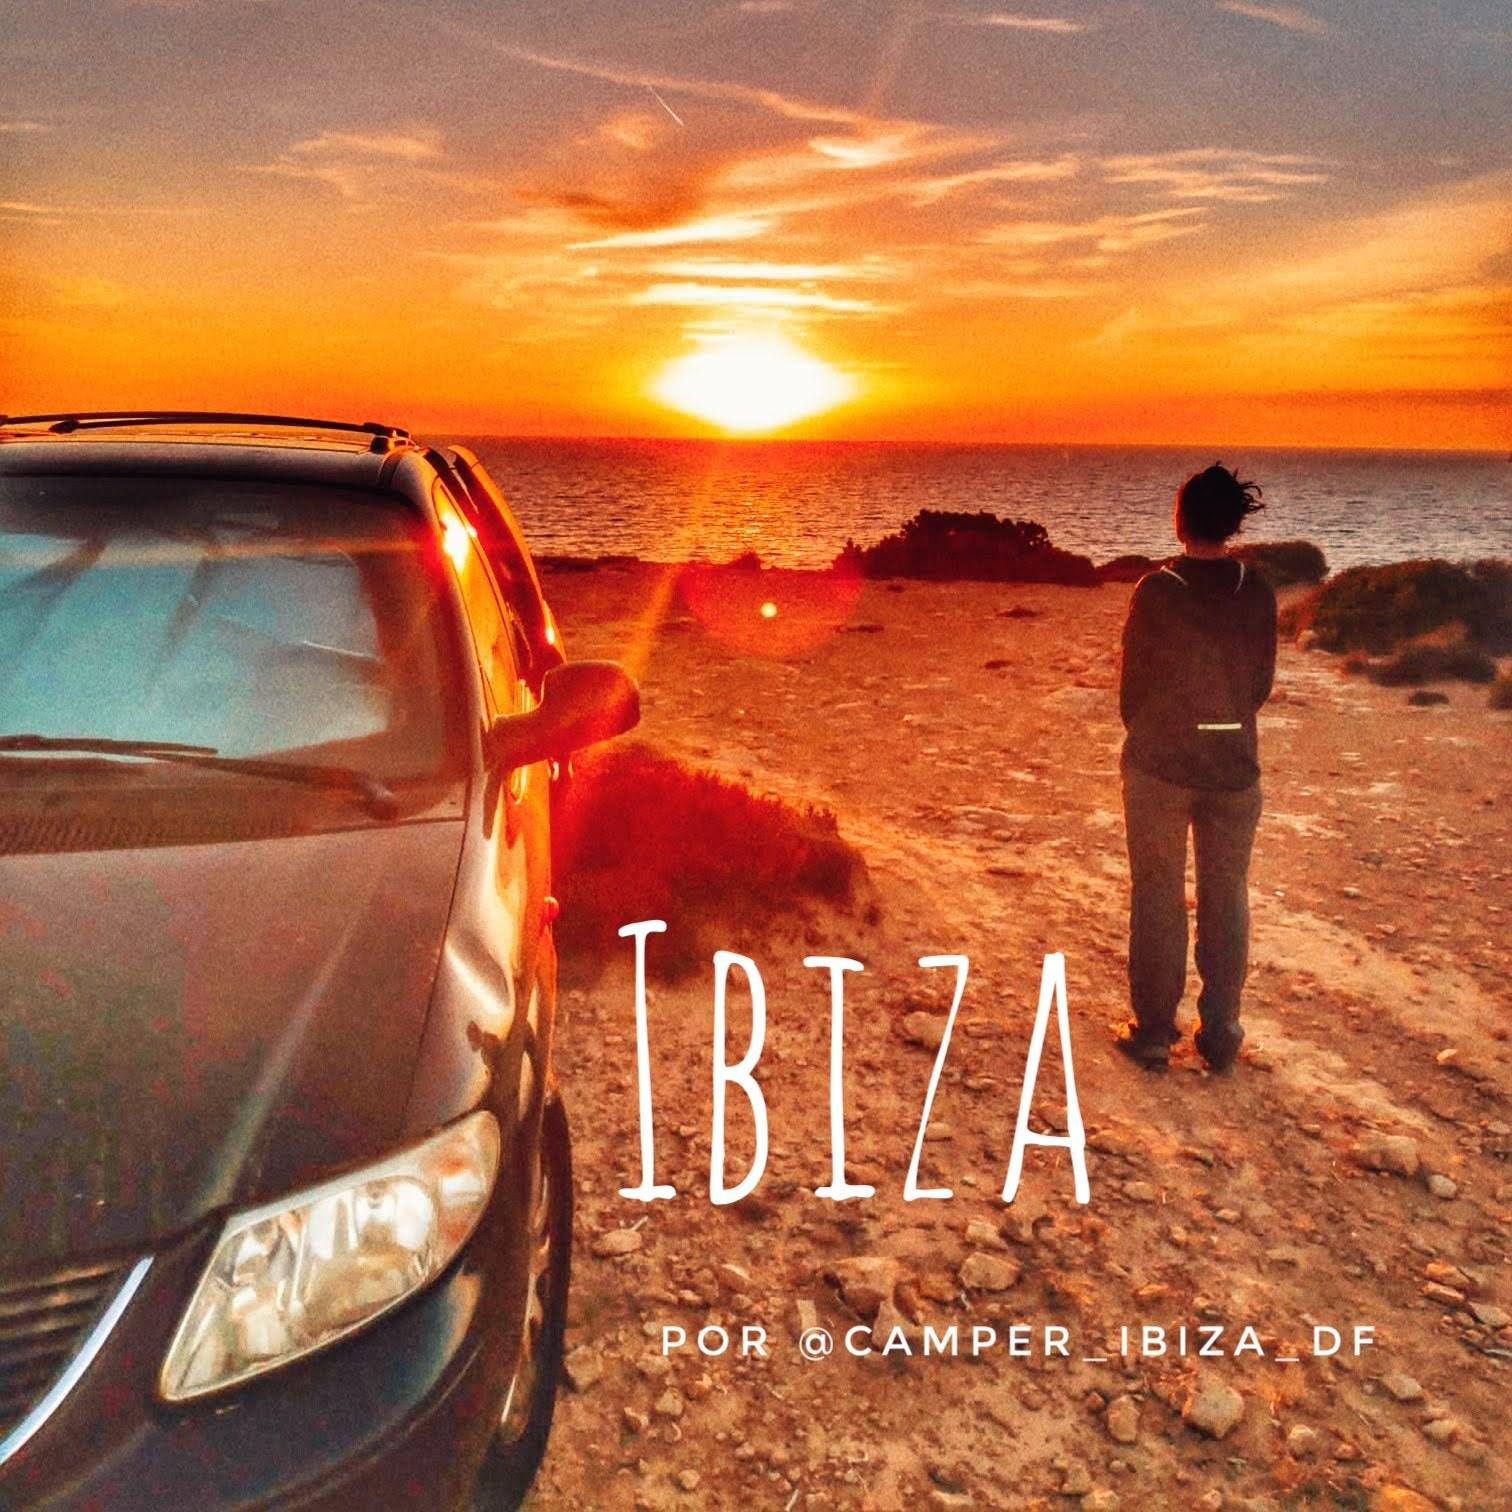 Itinerario intorno all'isola di Ibiza in camper o furgone di @camper_ibiza_df